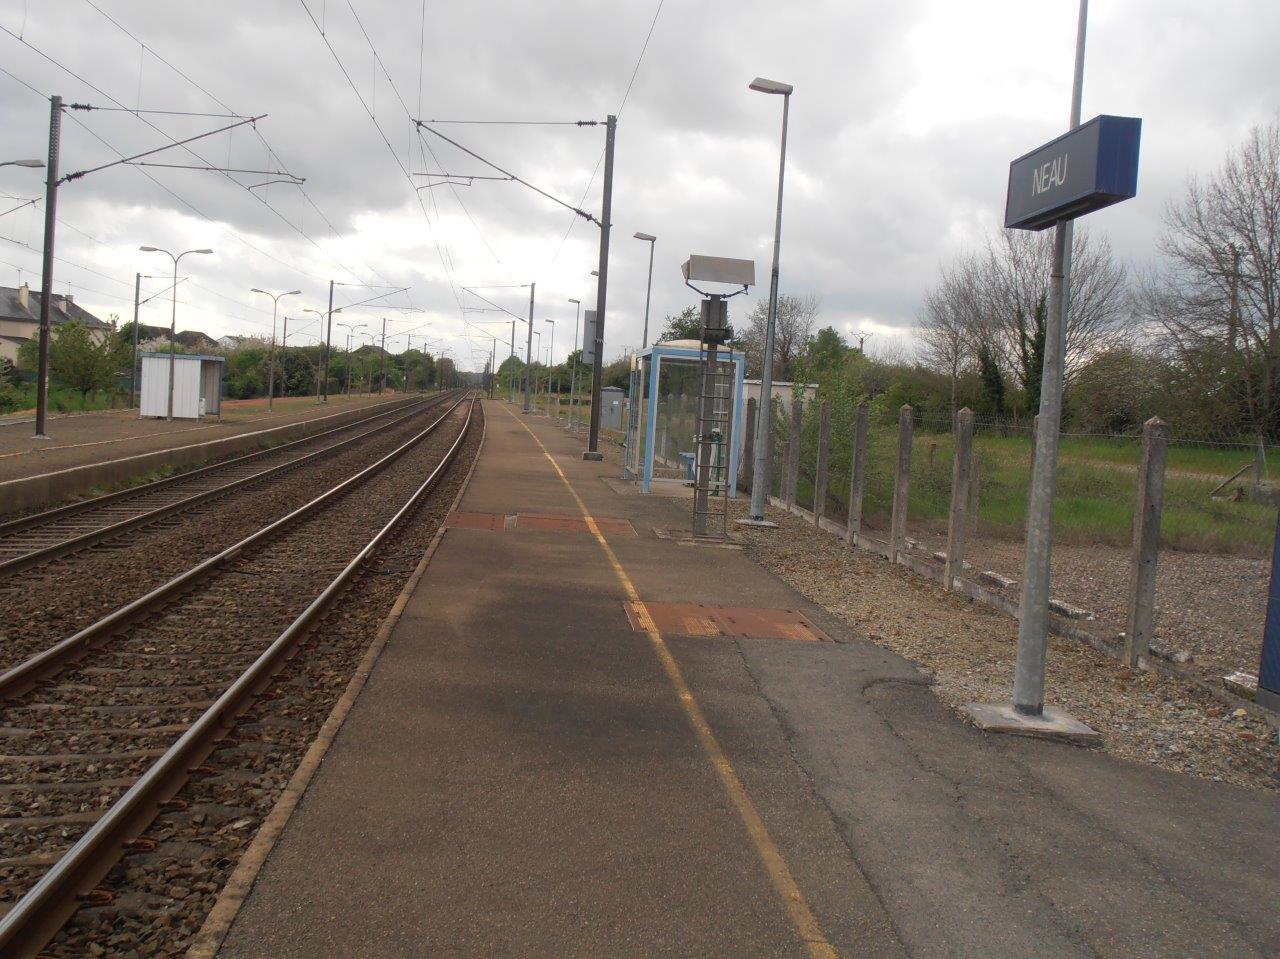 gare-de-neau-train-station